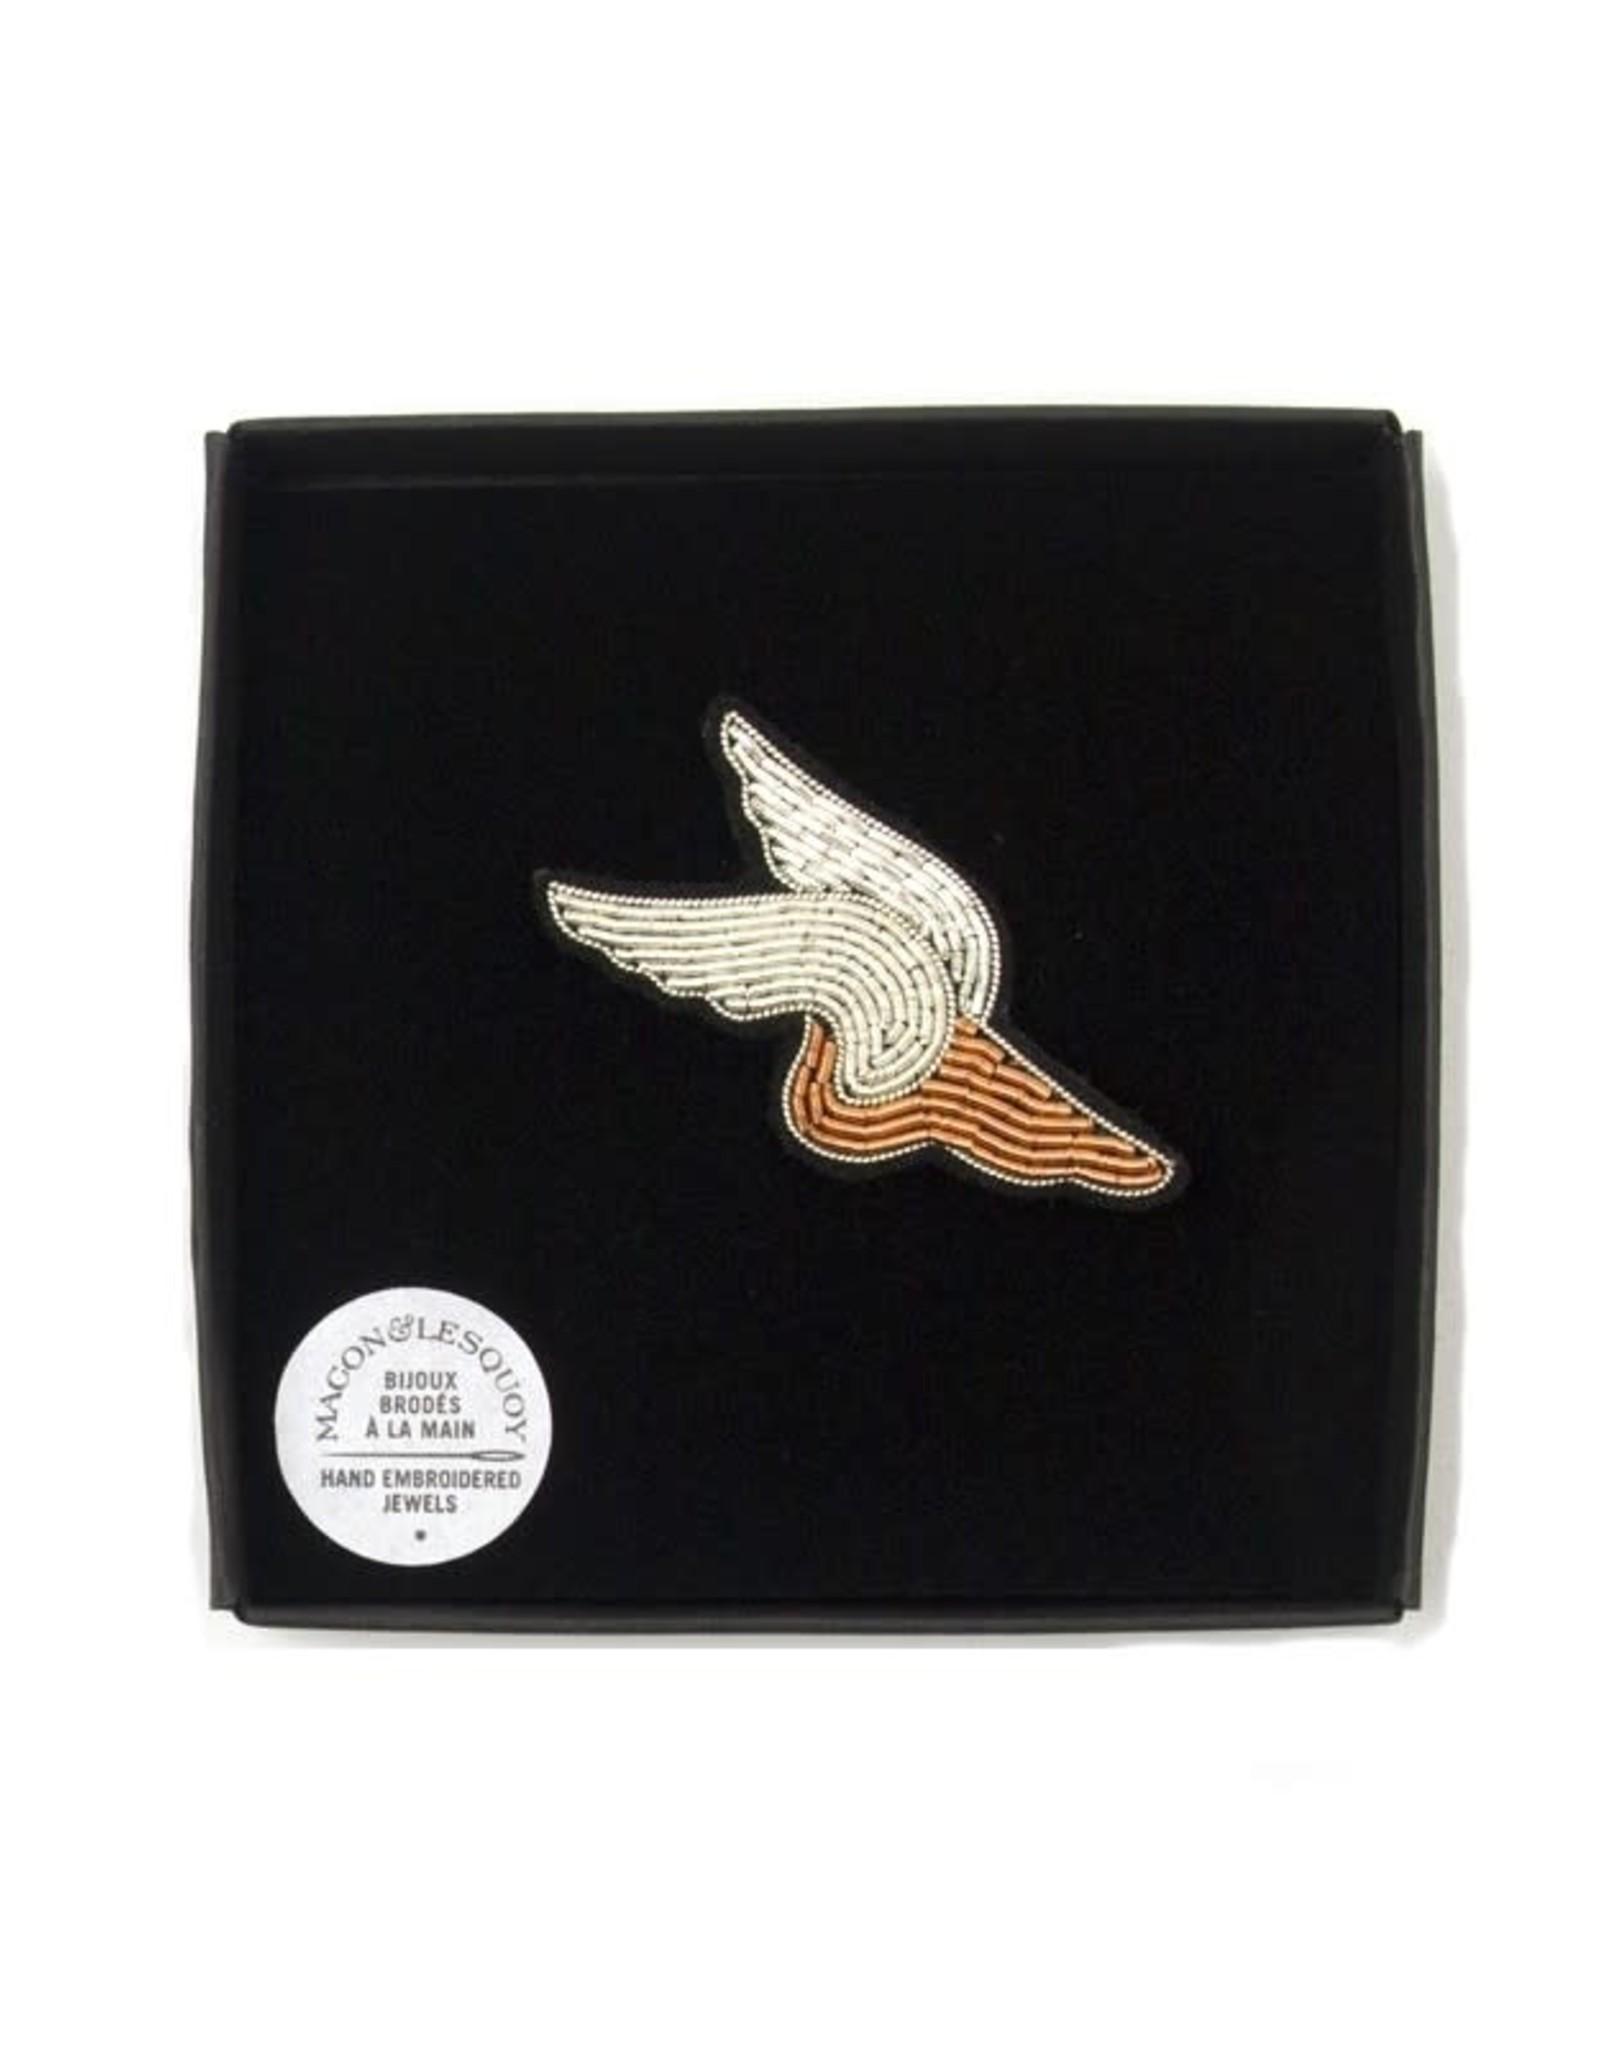 Macon & Lesquoy 'Hermes' Pin